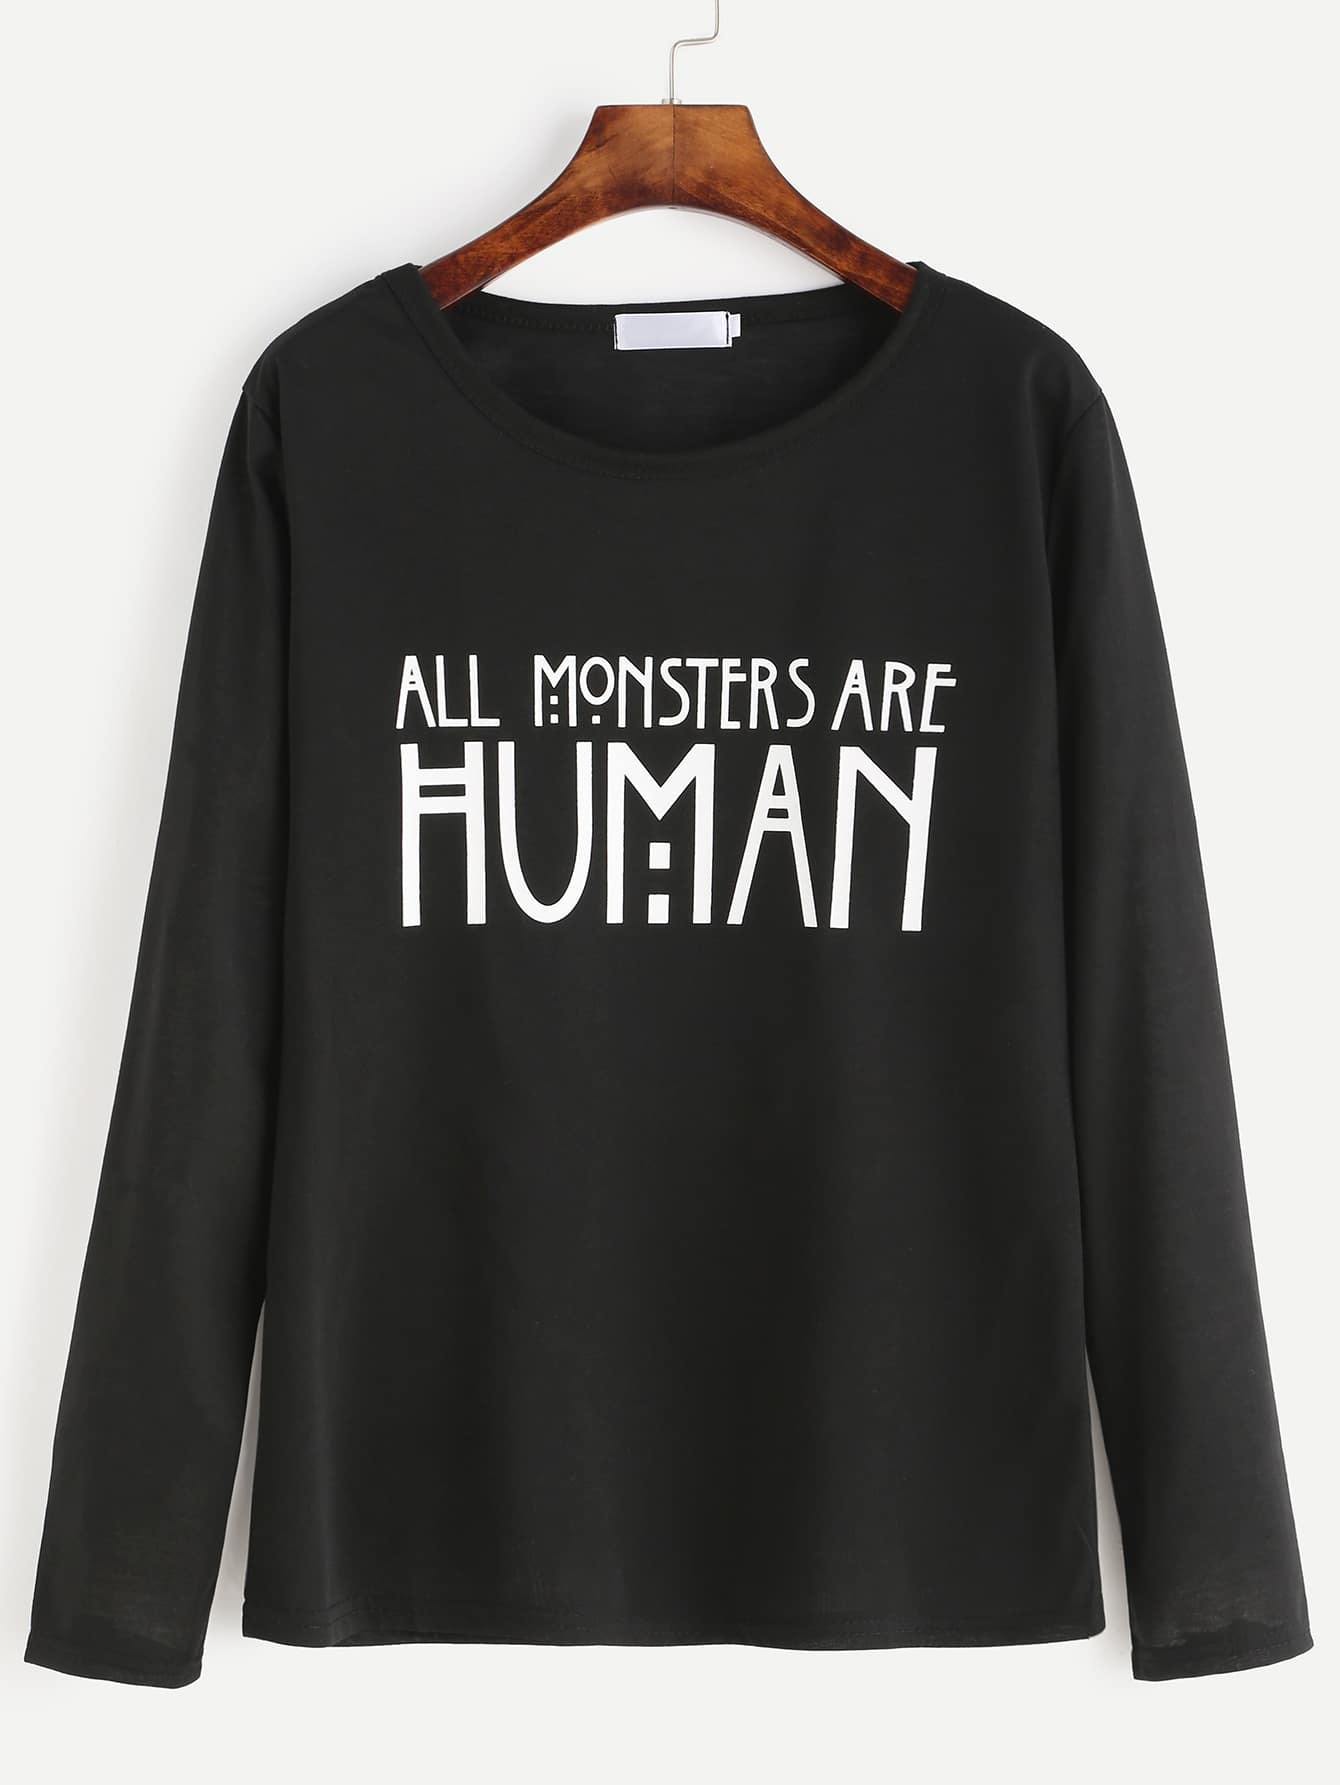 Black Slogan Print T-shirt tee160819101